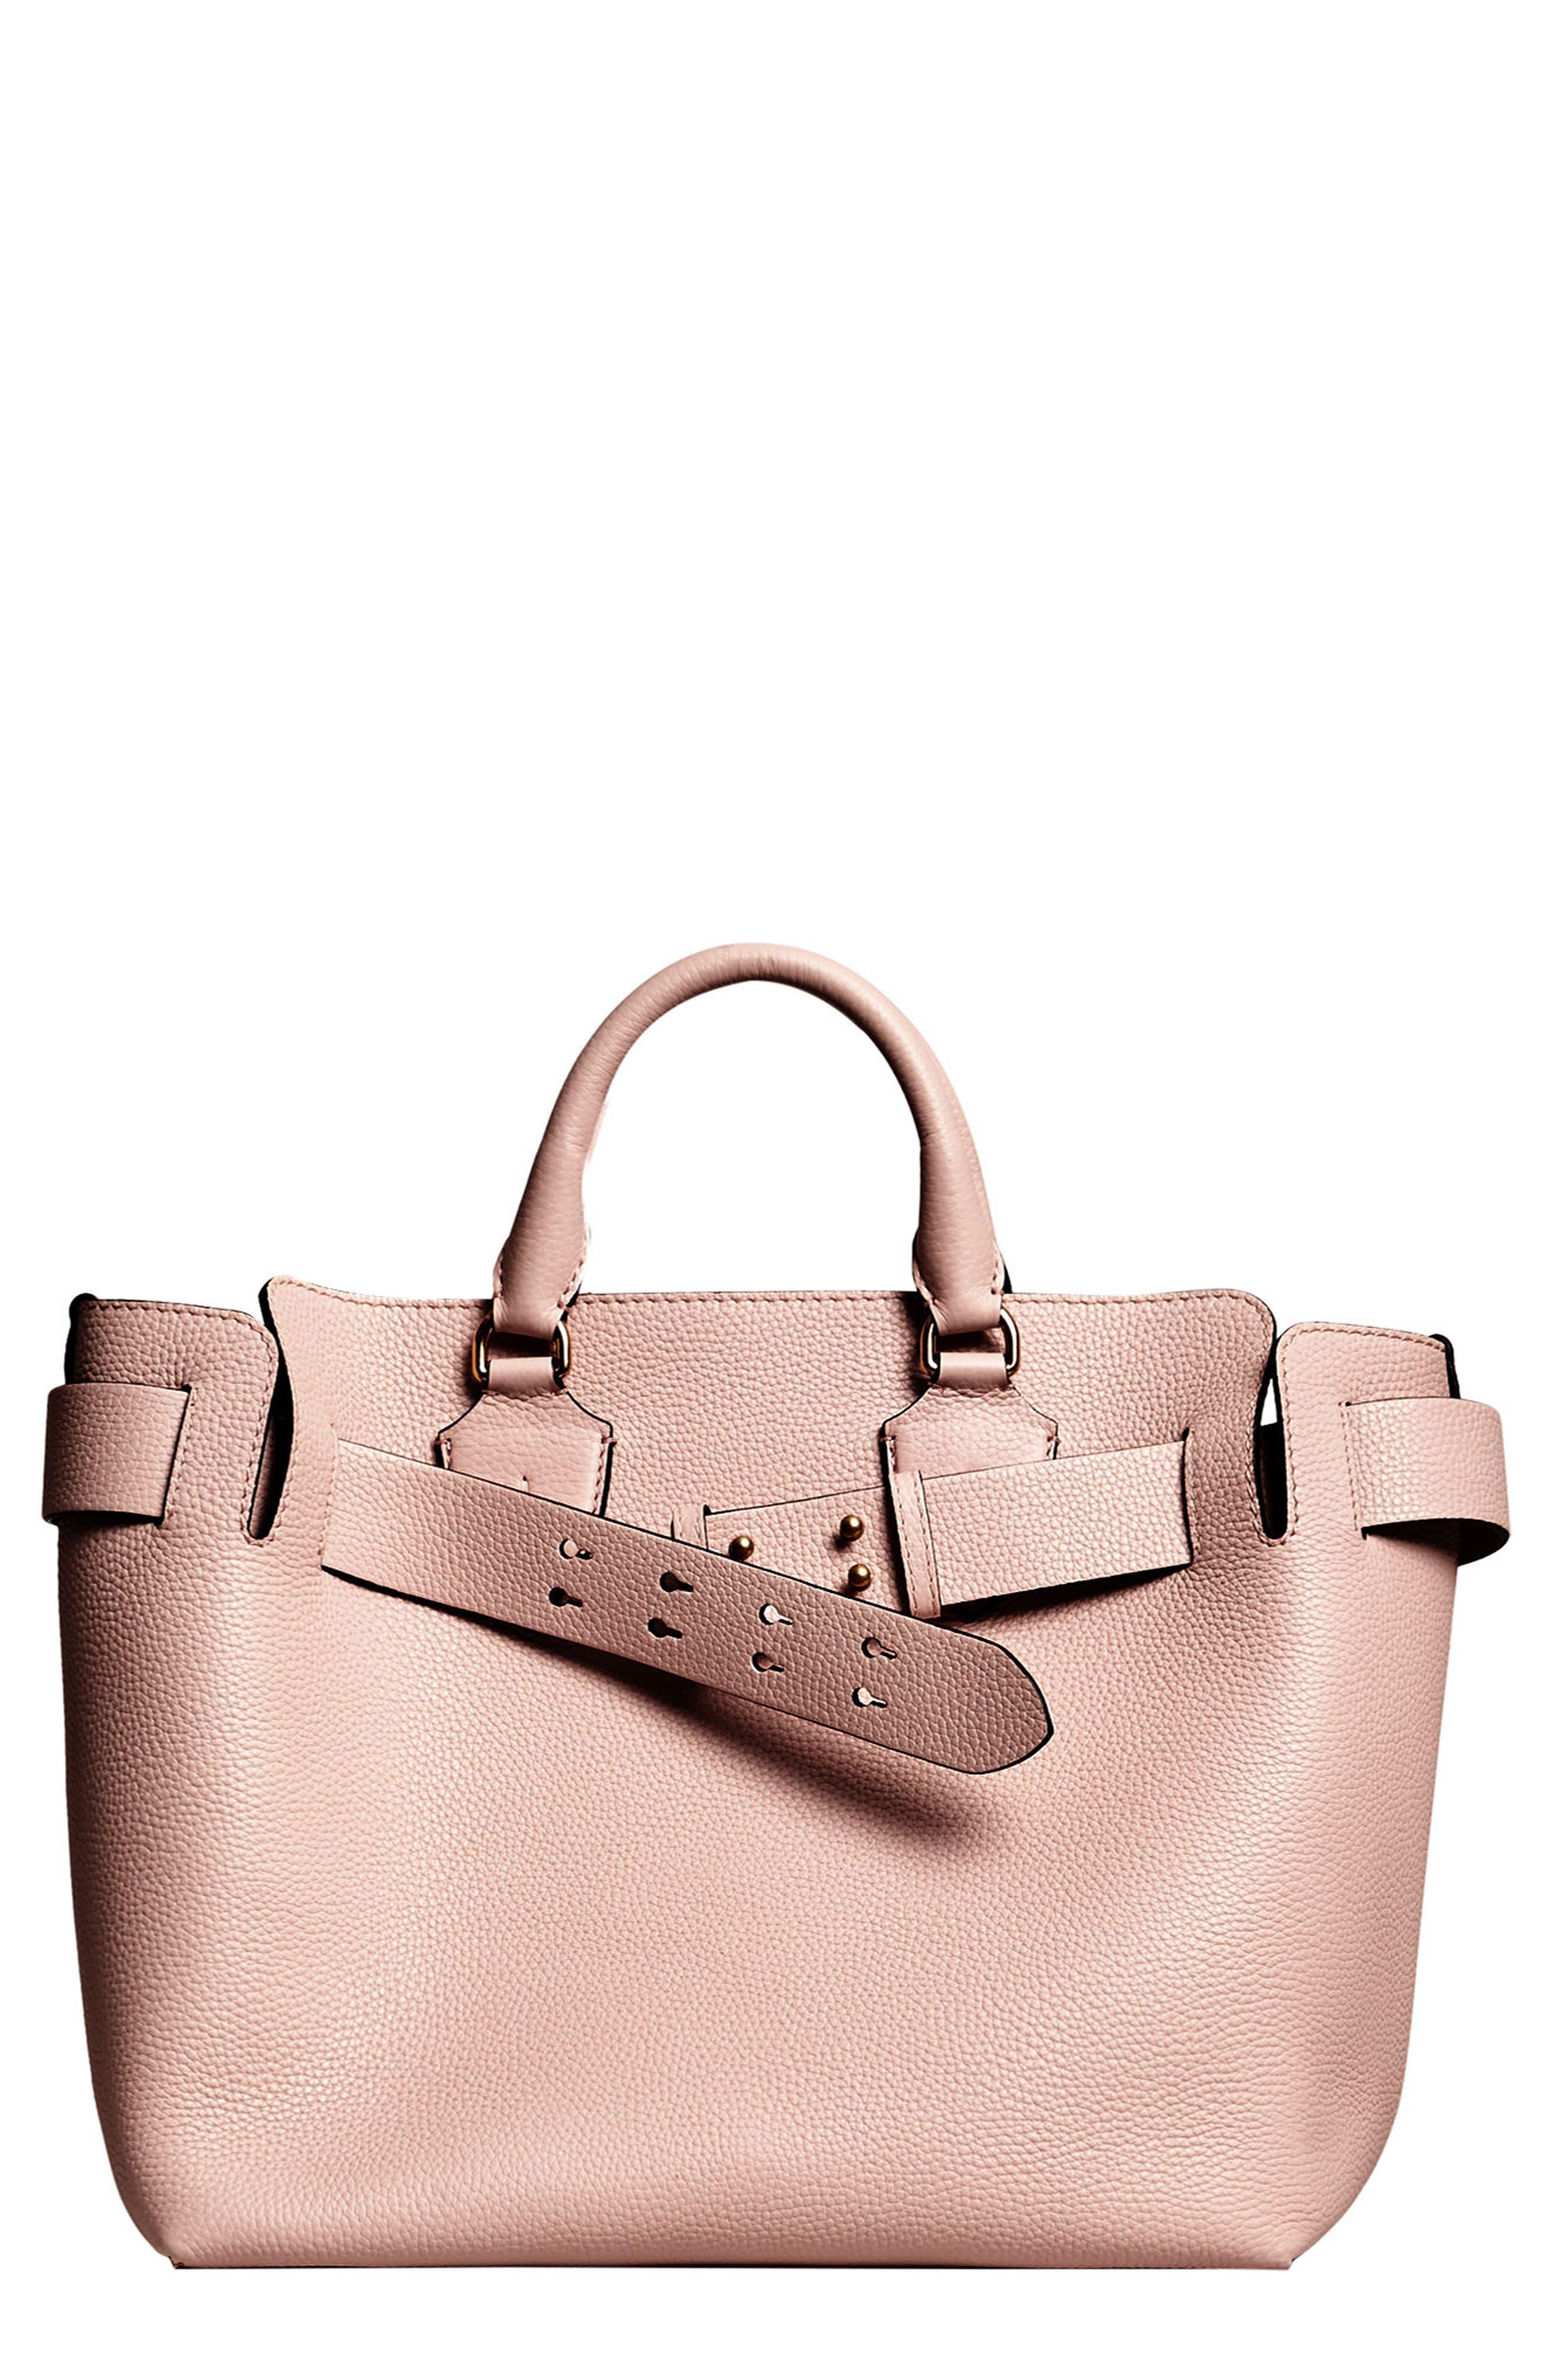 Medium Belt Bag Leather Tote,                             Main thumbnail 1, color,                             PALE ASH ROSE